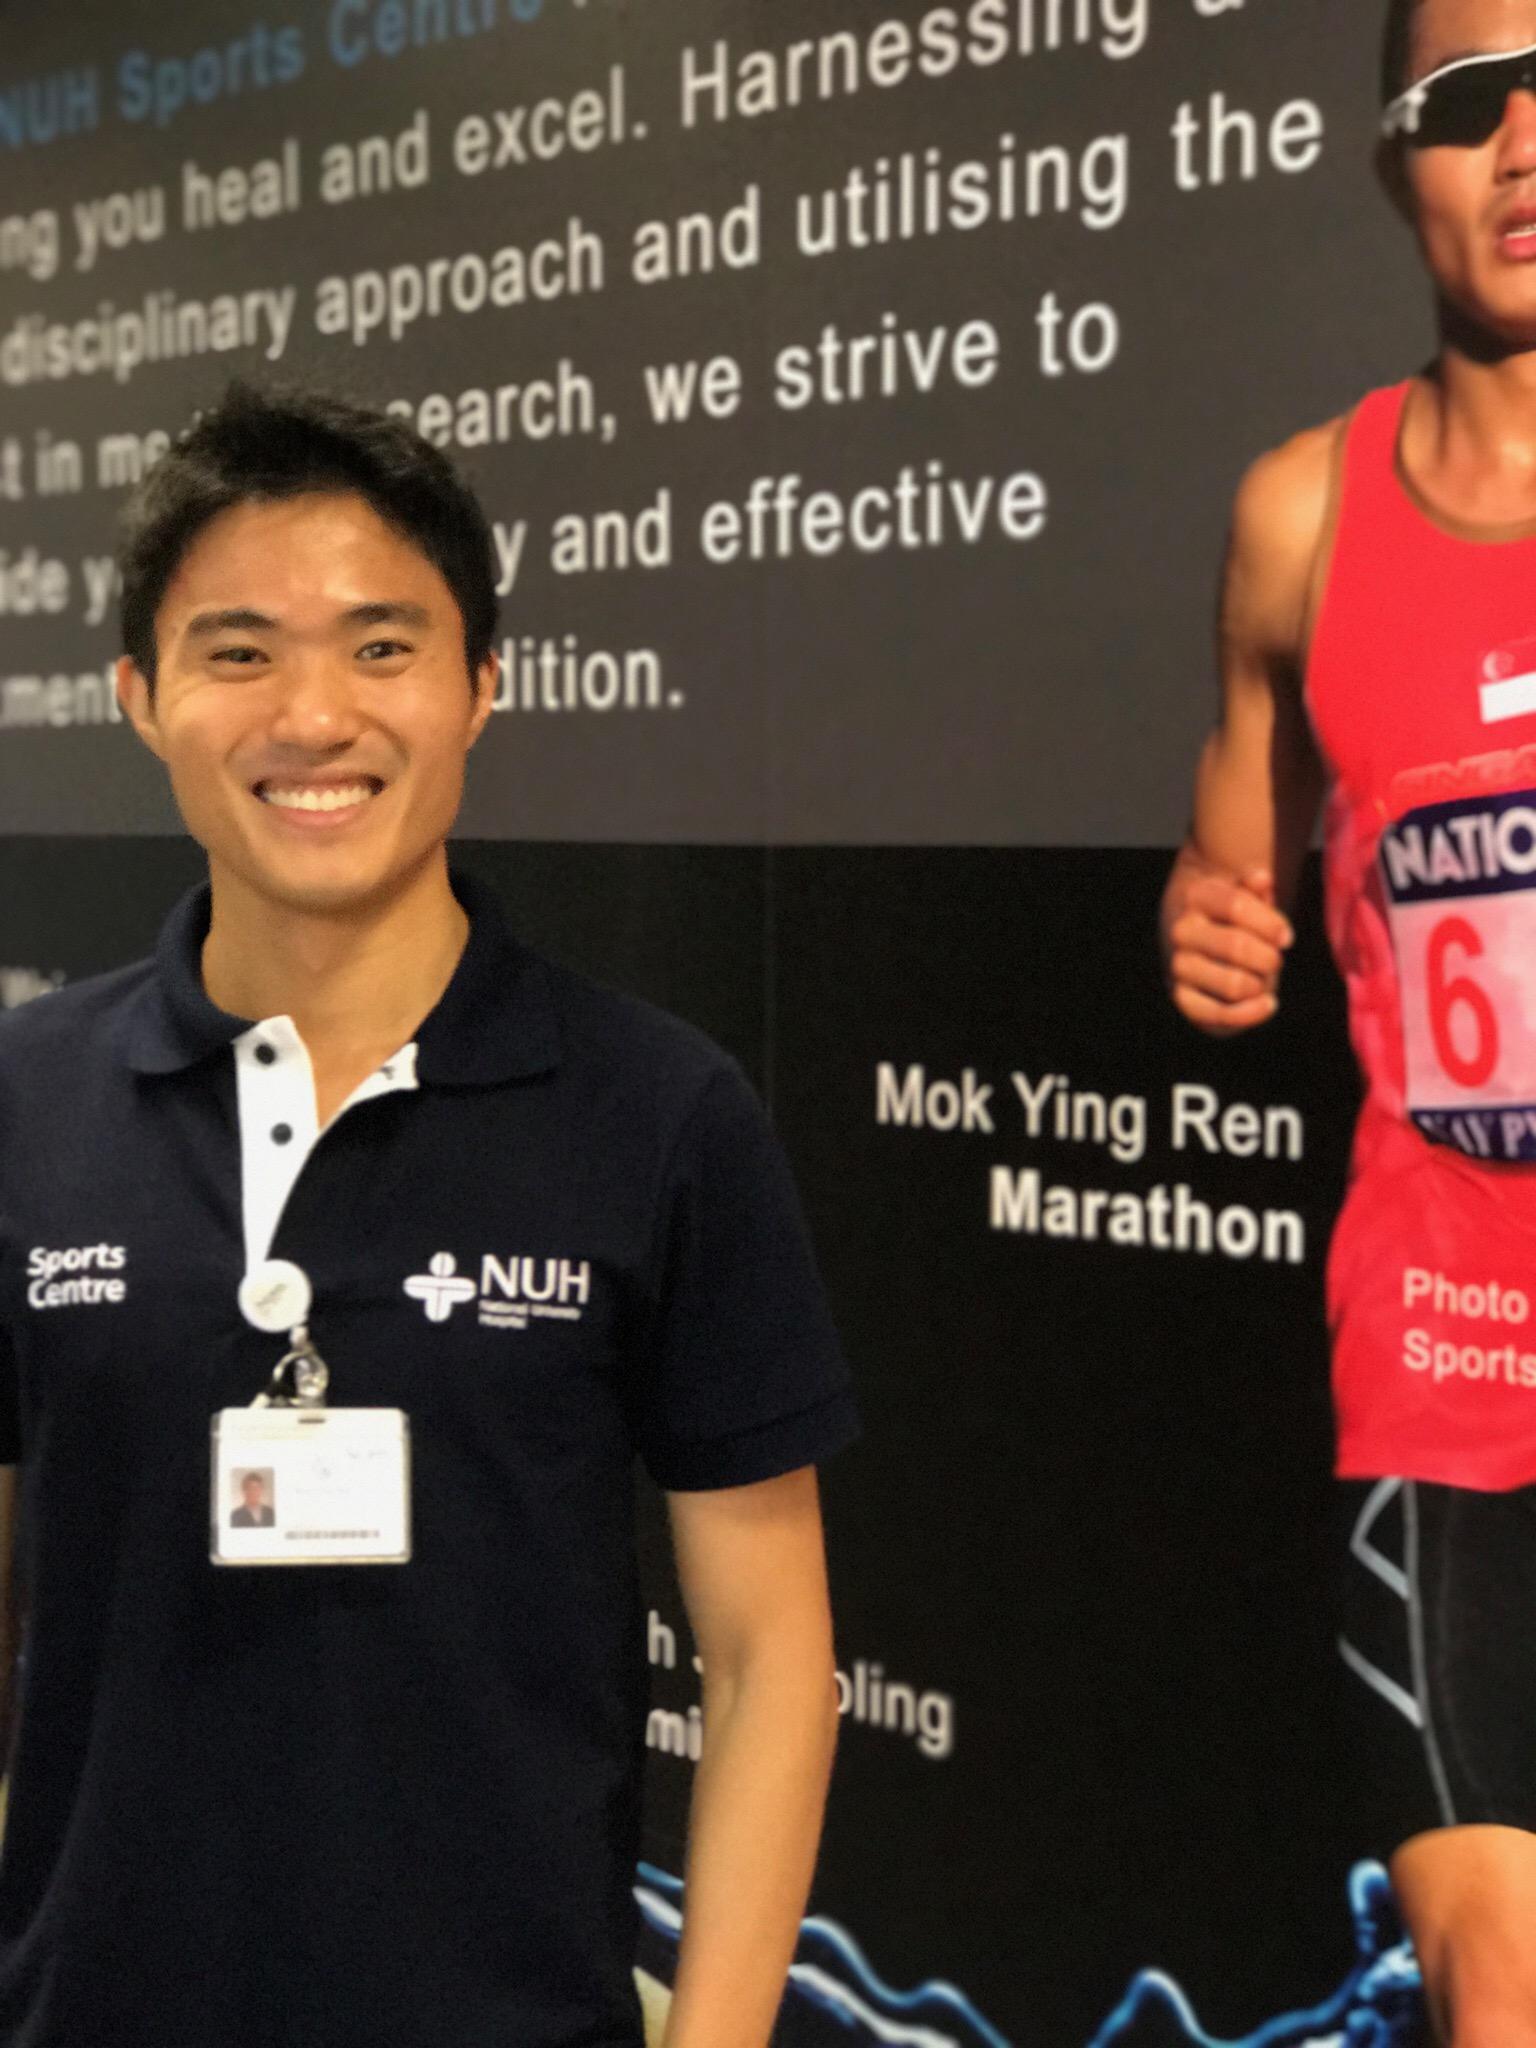 2017 Updates – #RunWithMok